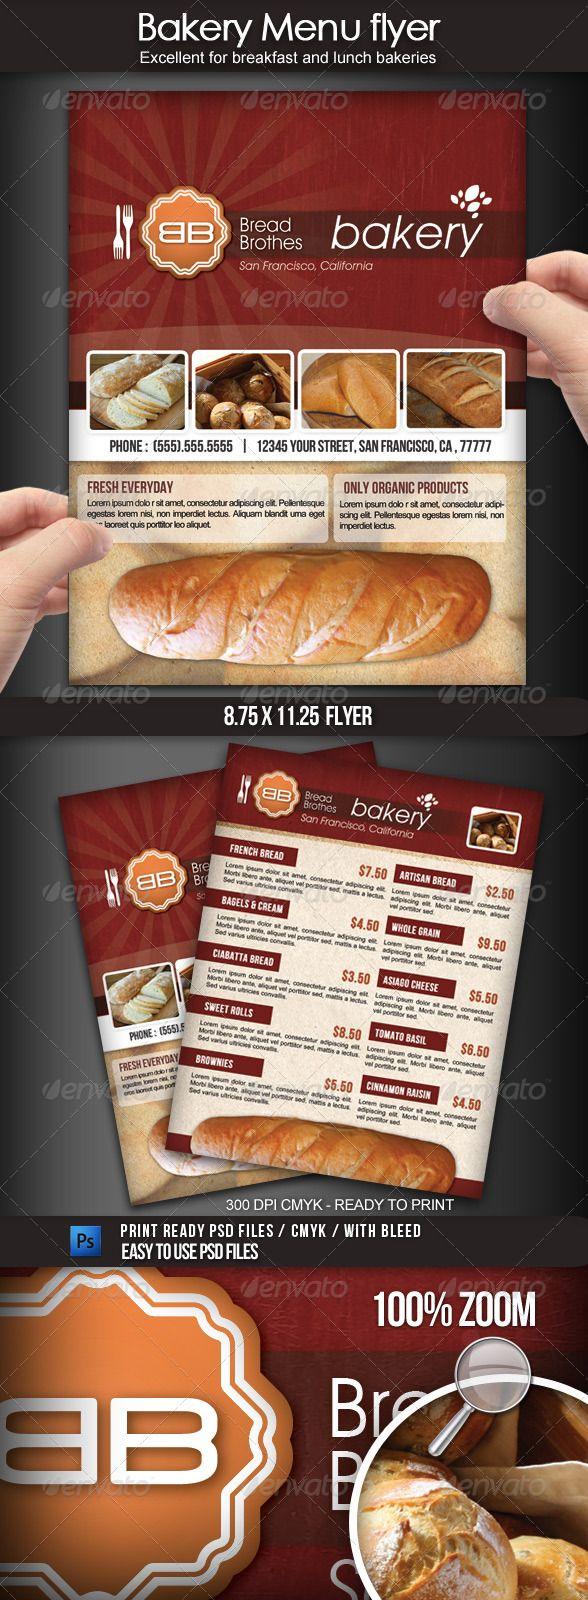 Bakery Menu Flyer Bakery Menu Bakeries And Menu - Bakery brochure template free